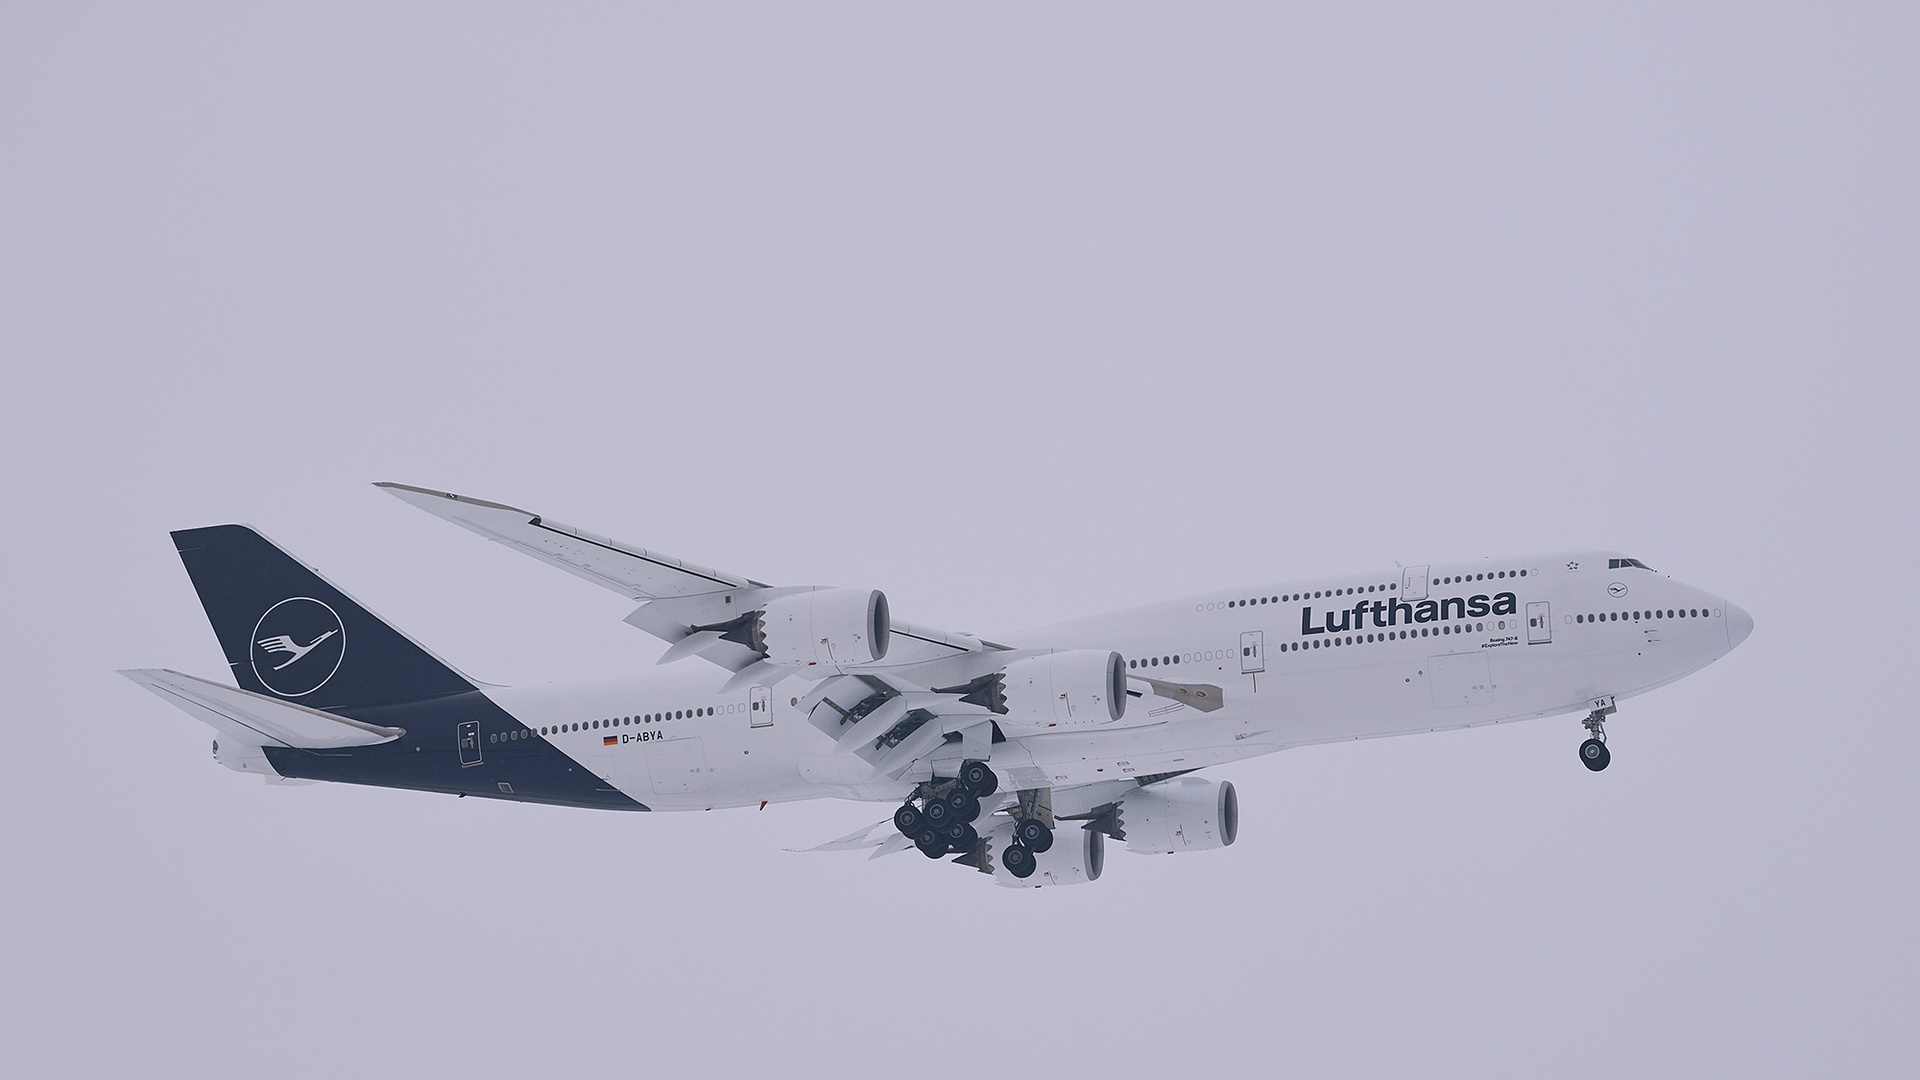 D-ABYA - Lufthansa - Boeing 747-8